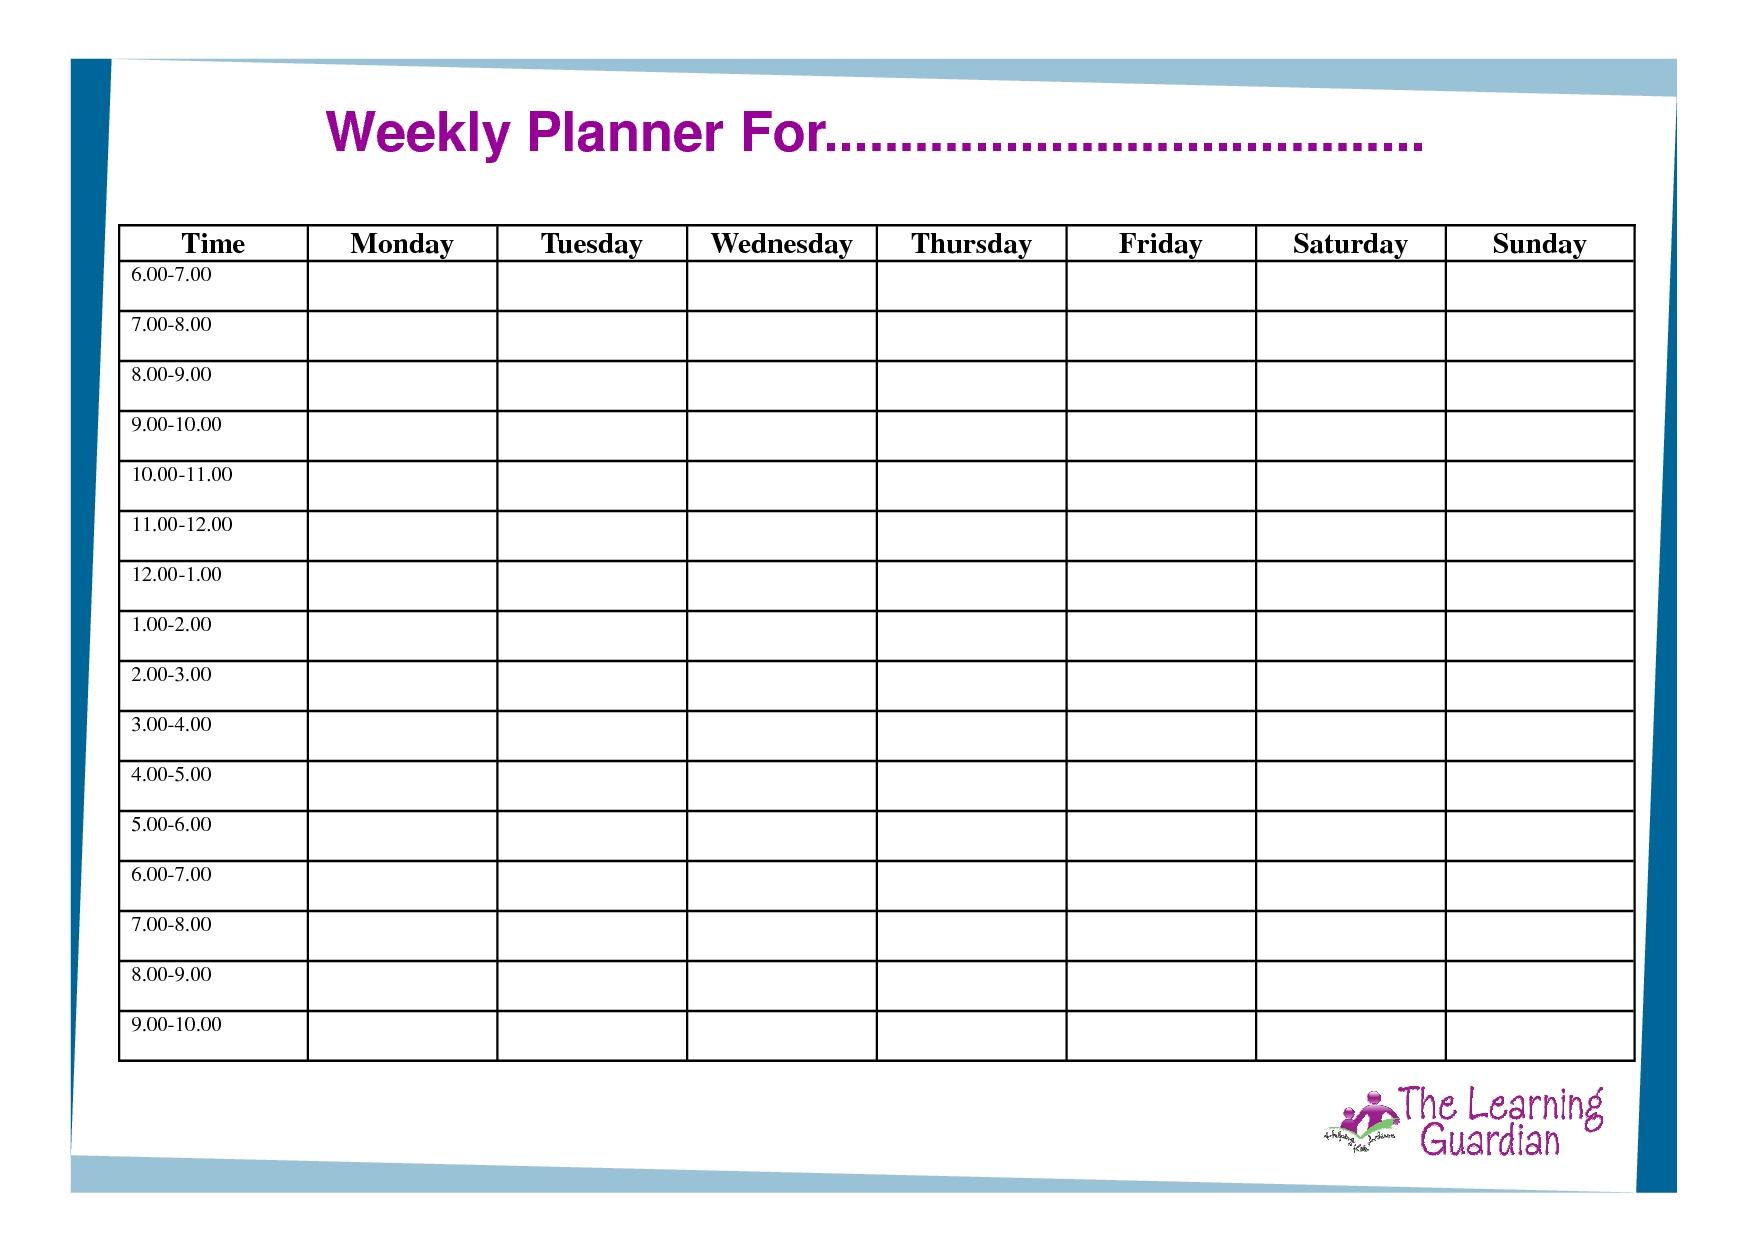 One Week Calendar With Hours Calendar Inspiration Design